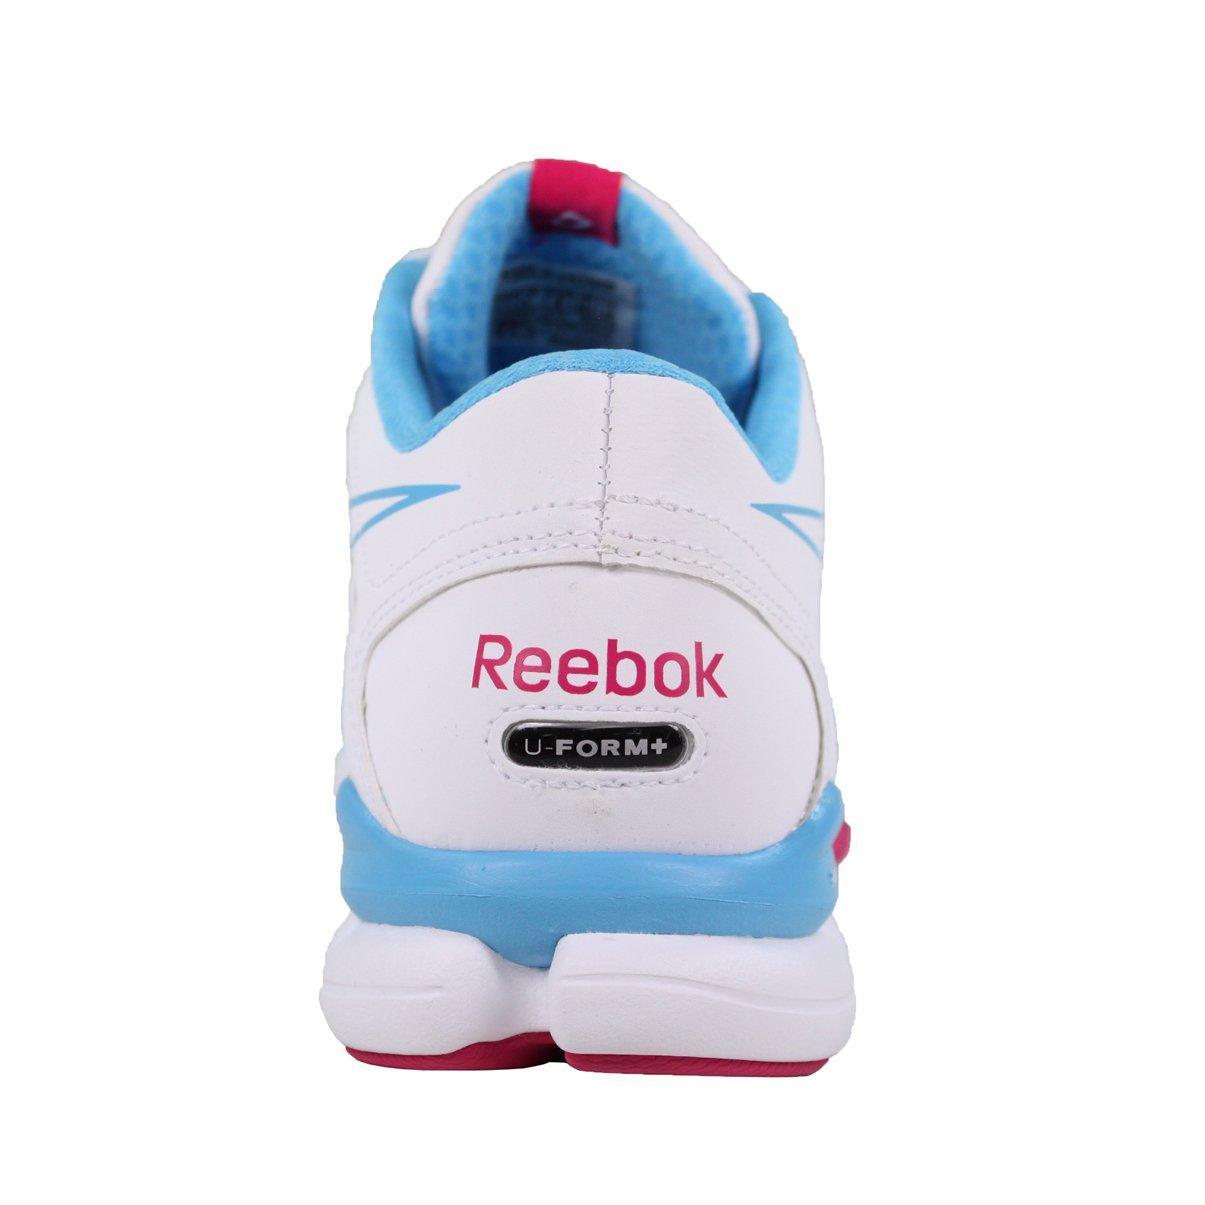 Reebok Damen Rf Fusion Tr 3.0Ufo 3.0Ufo 3.0Ufo Sportschuhe Mehrfarbig 13136c